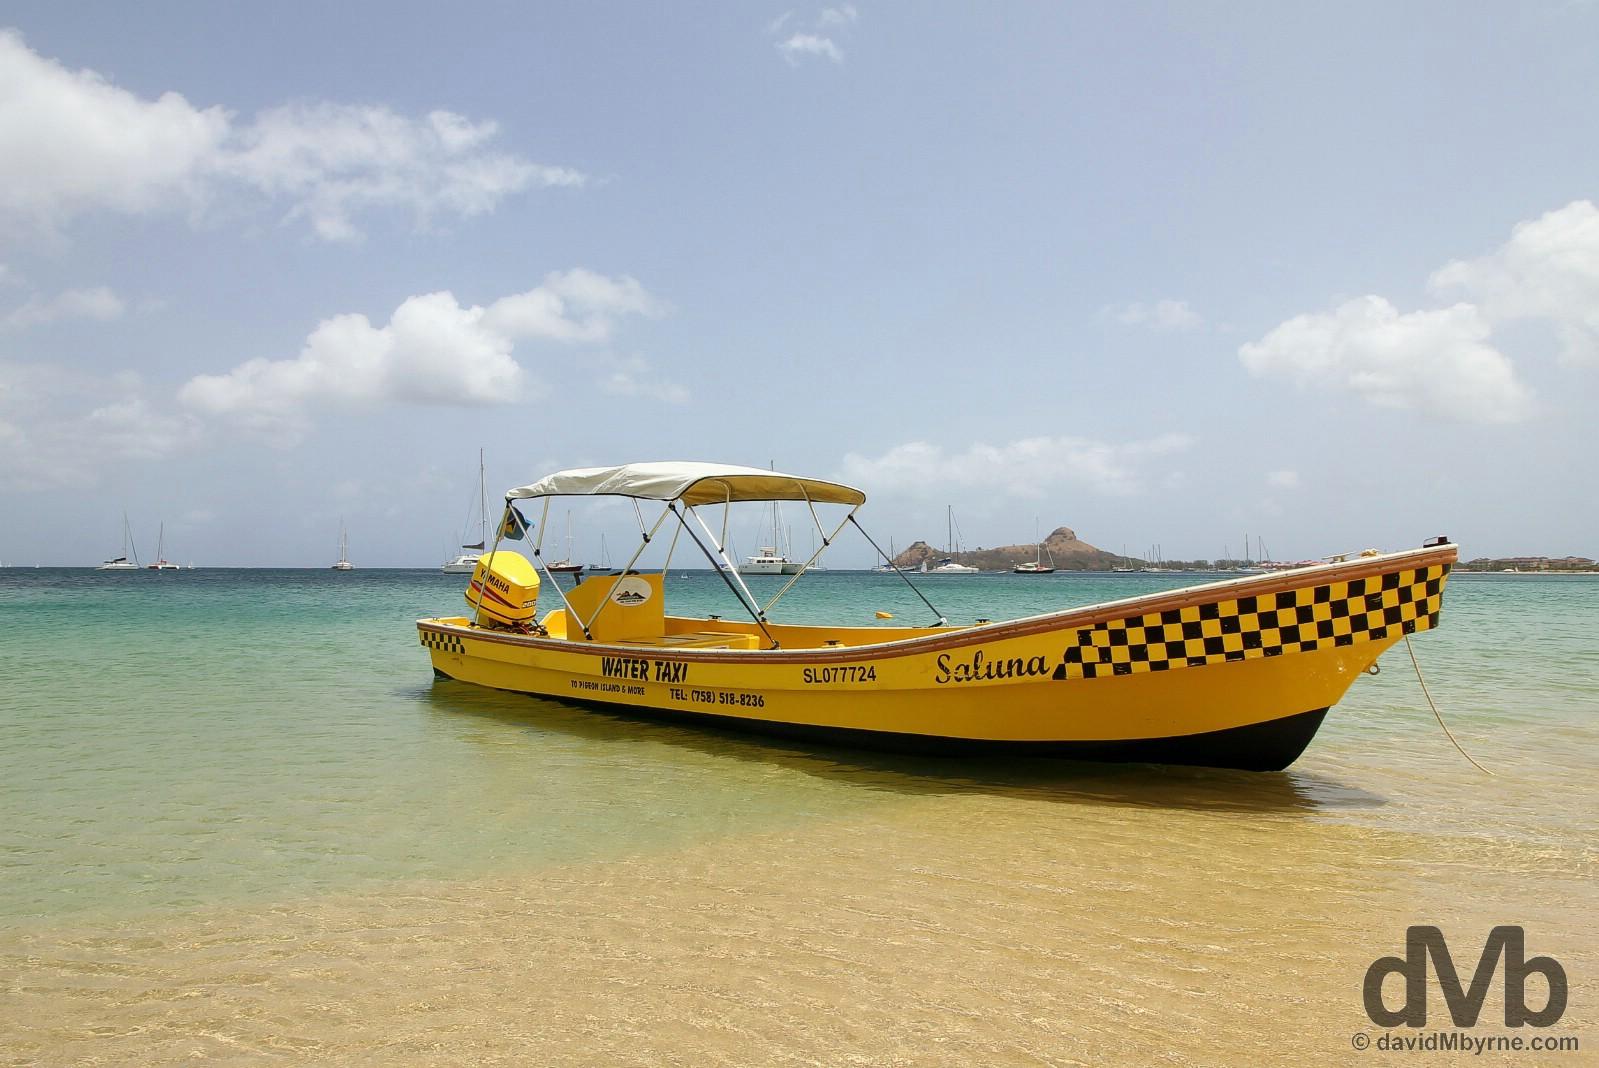 A water taxi on Reduit Beach, Rodney Bay, St. Lucia, Lesser Antilles. June 14, 2015.